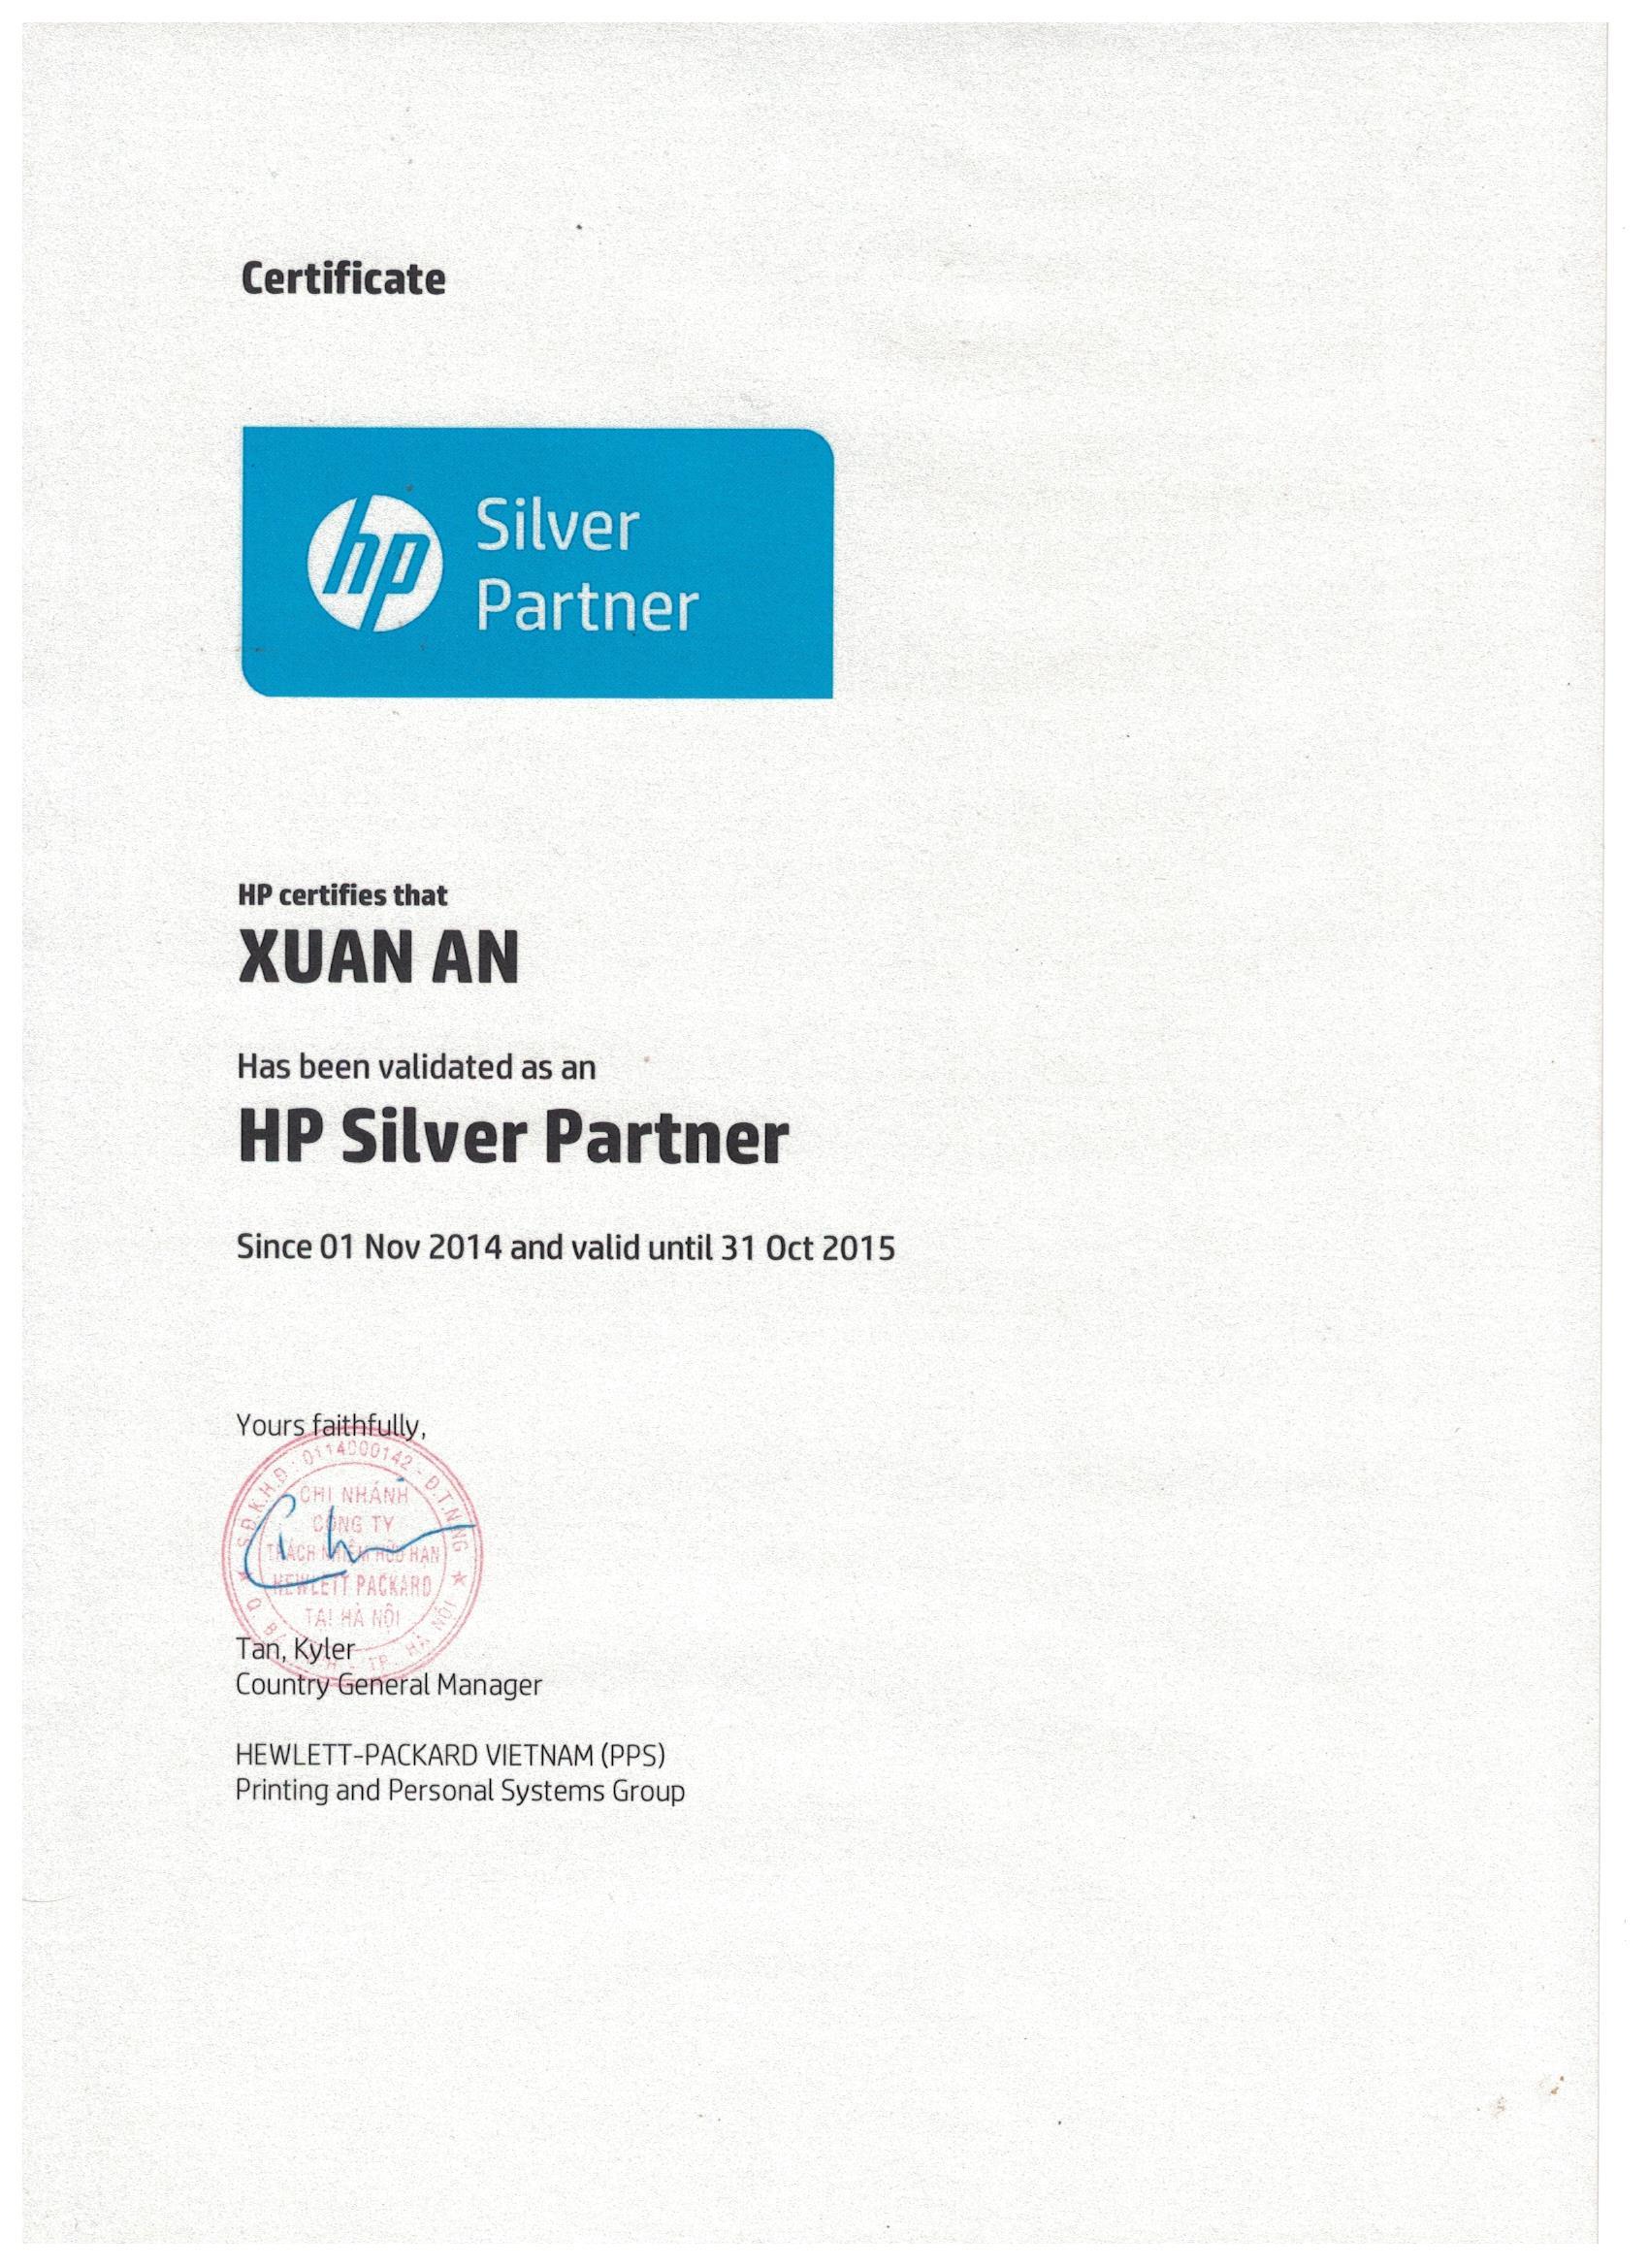 HP Probook 430 G5 - 2XR78PA (Silver)